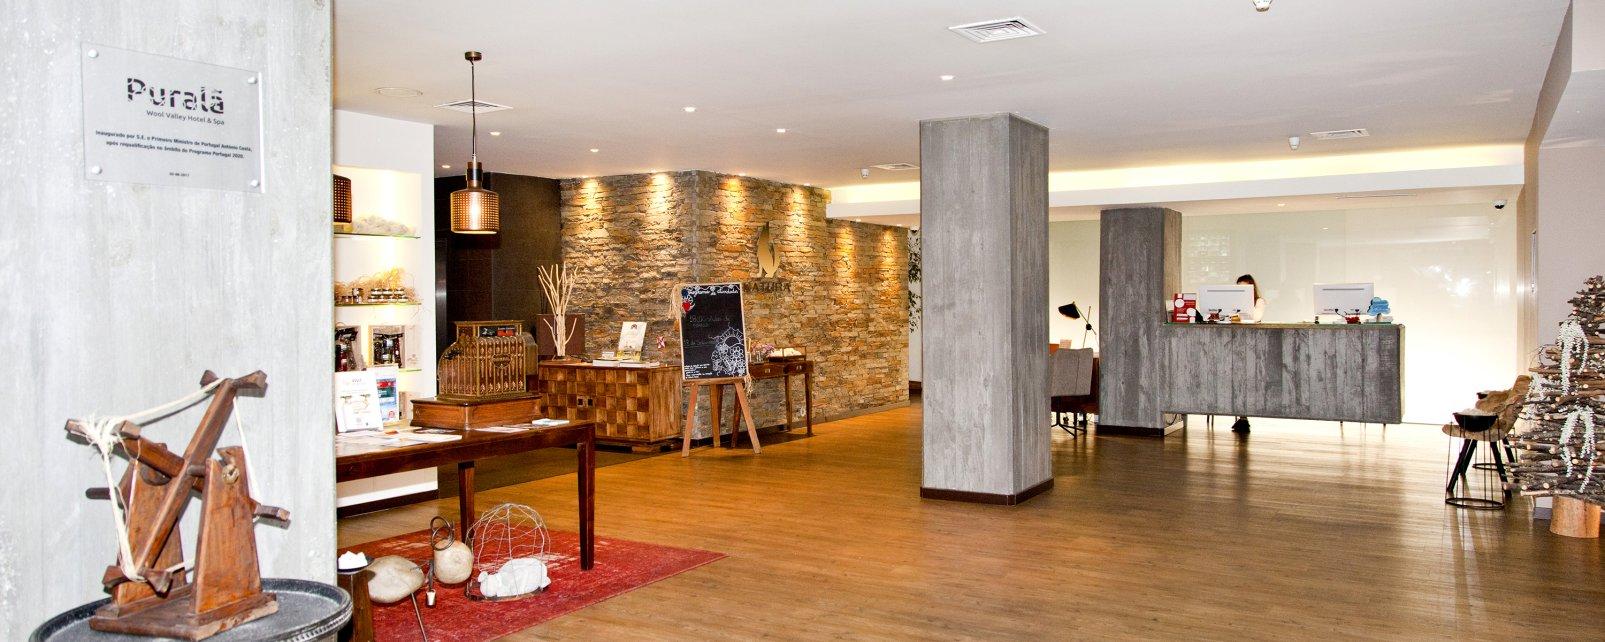 Hôtel Puralã - Wool Valley Hotel SPA